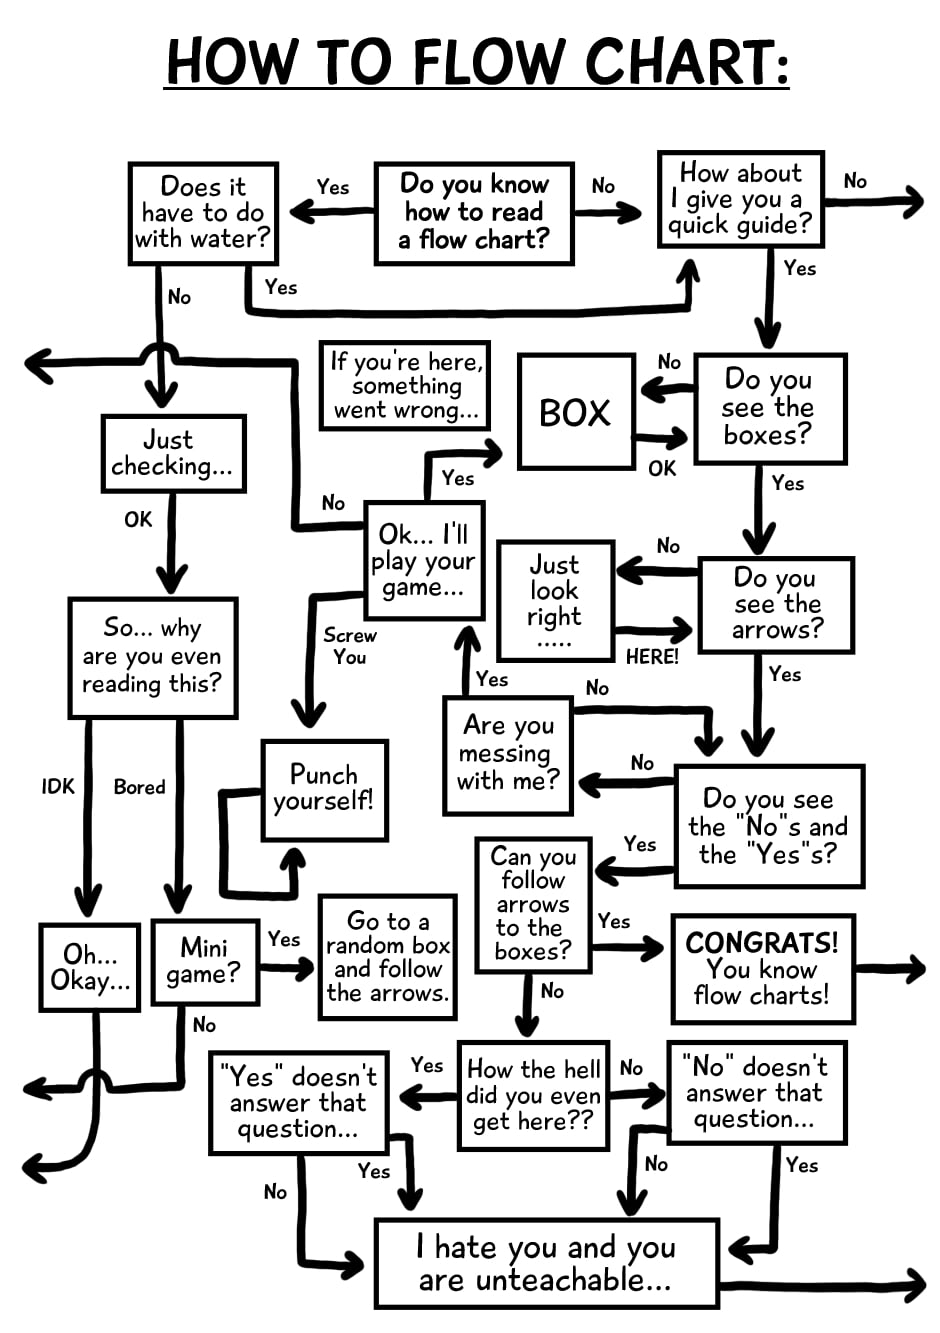 A hilarious flowchart explaining flowcharts digg sketchy antics flow chart image 1 nvjuhfo Image collections